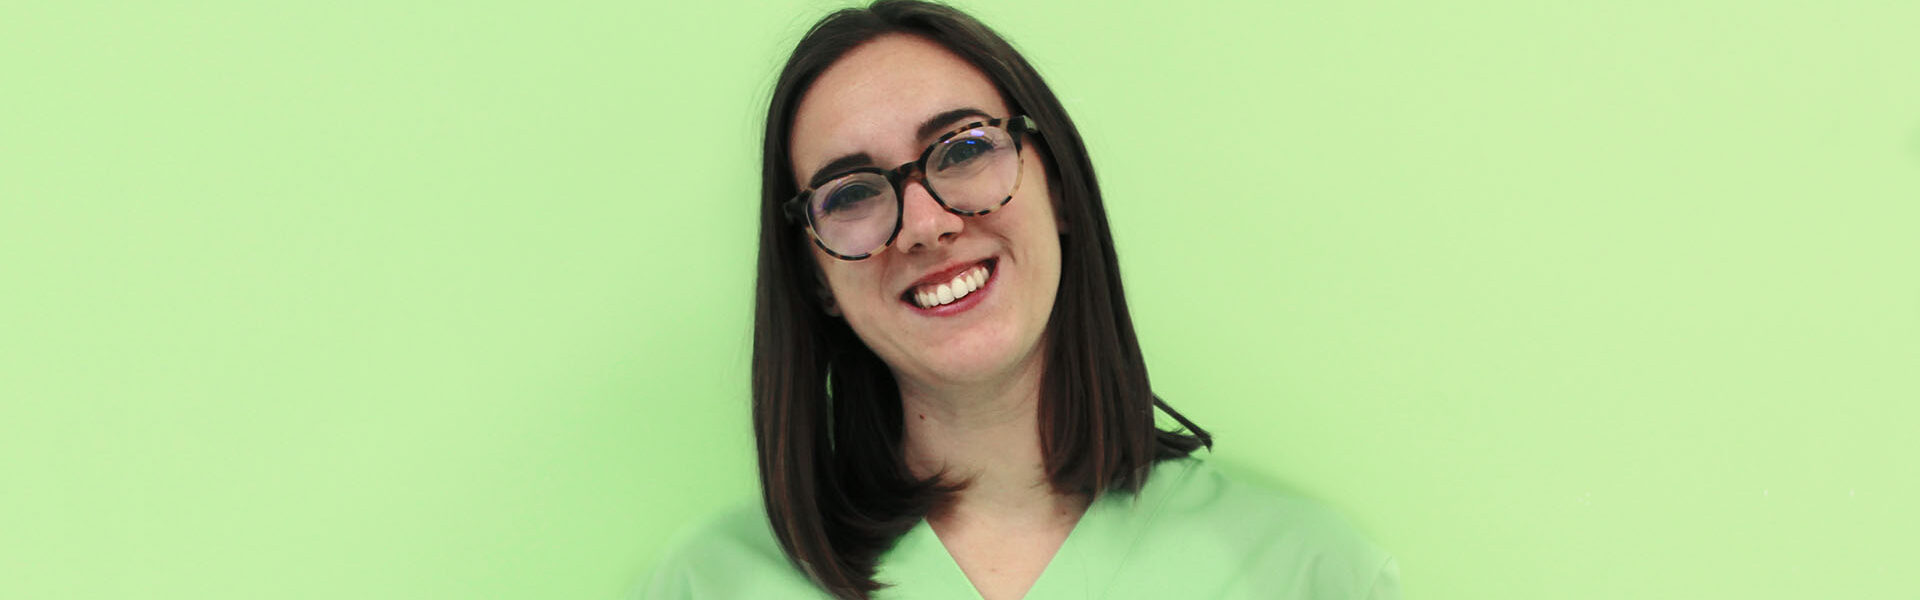 Flavia Pizzicarola, Logopedista